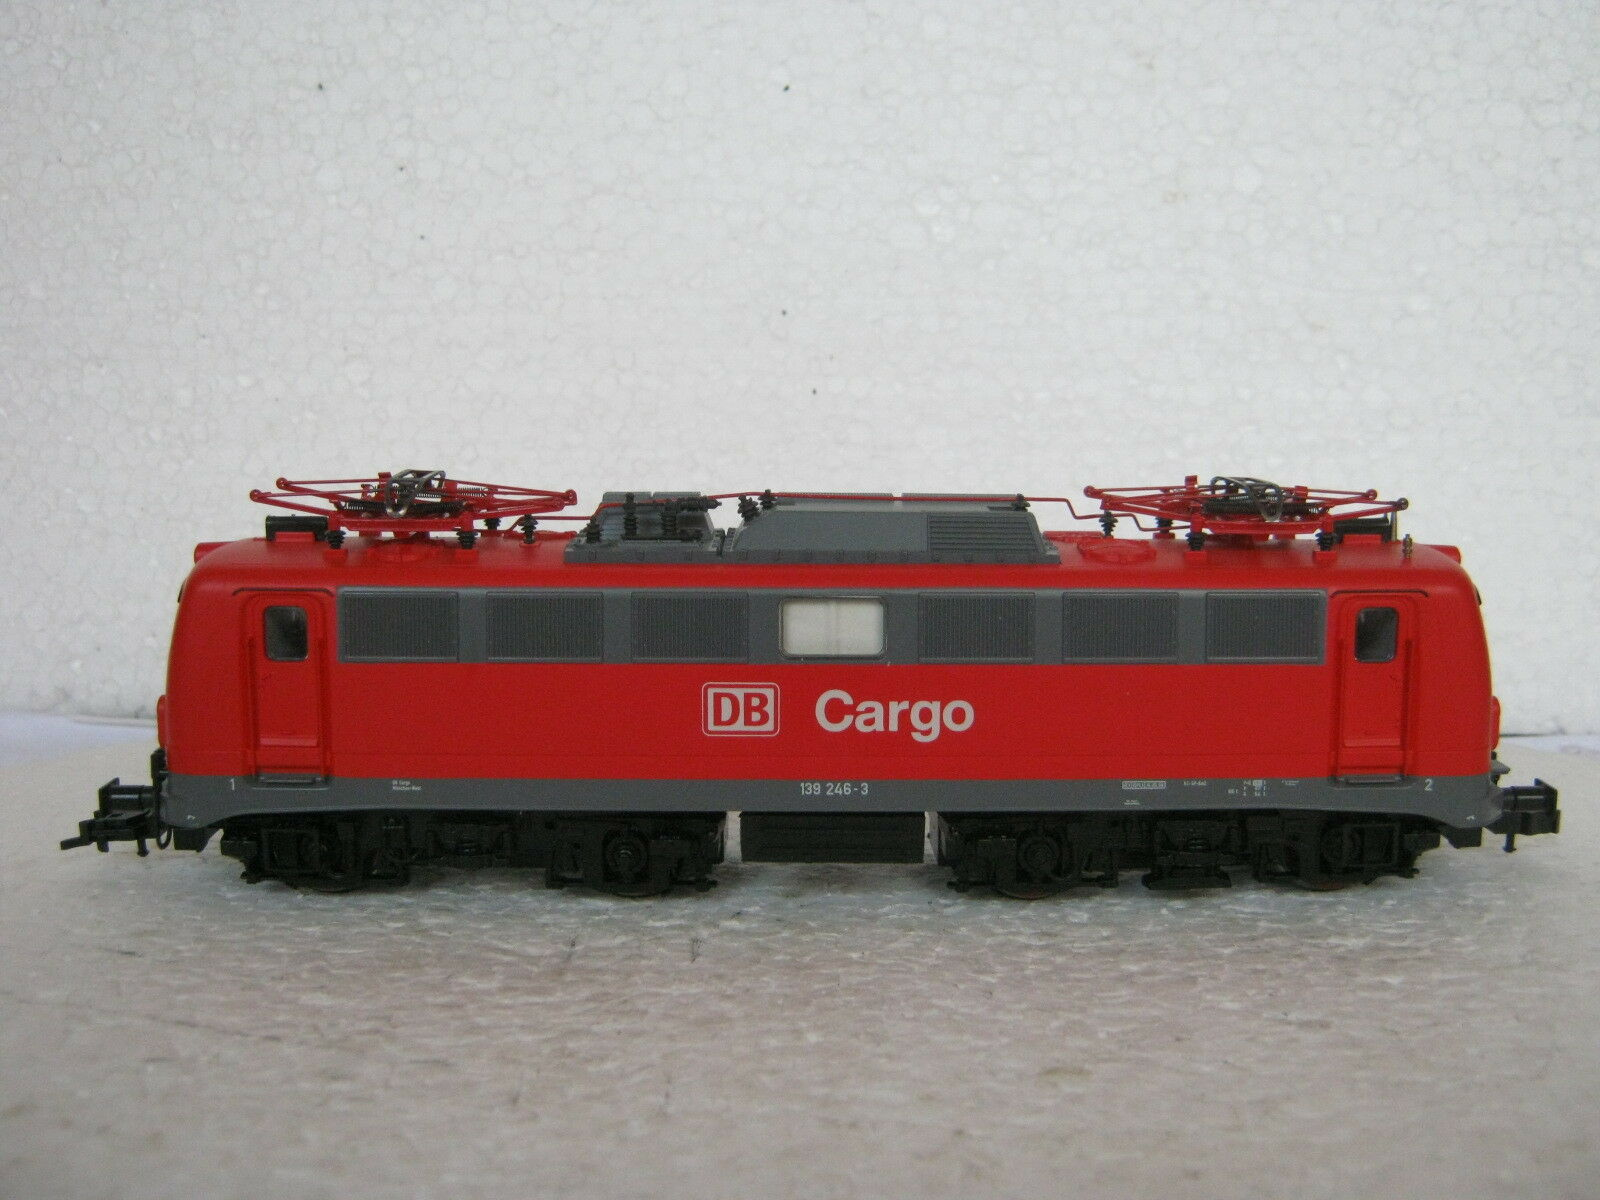 Digital roco ho DC 43386 e Lok Lok Lok BR 139 246-3 DB autogo (rg cn 154-79s7 3) 64c905